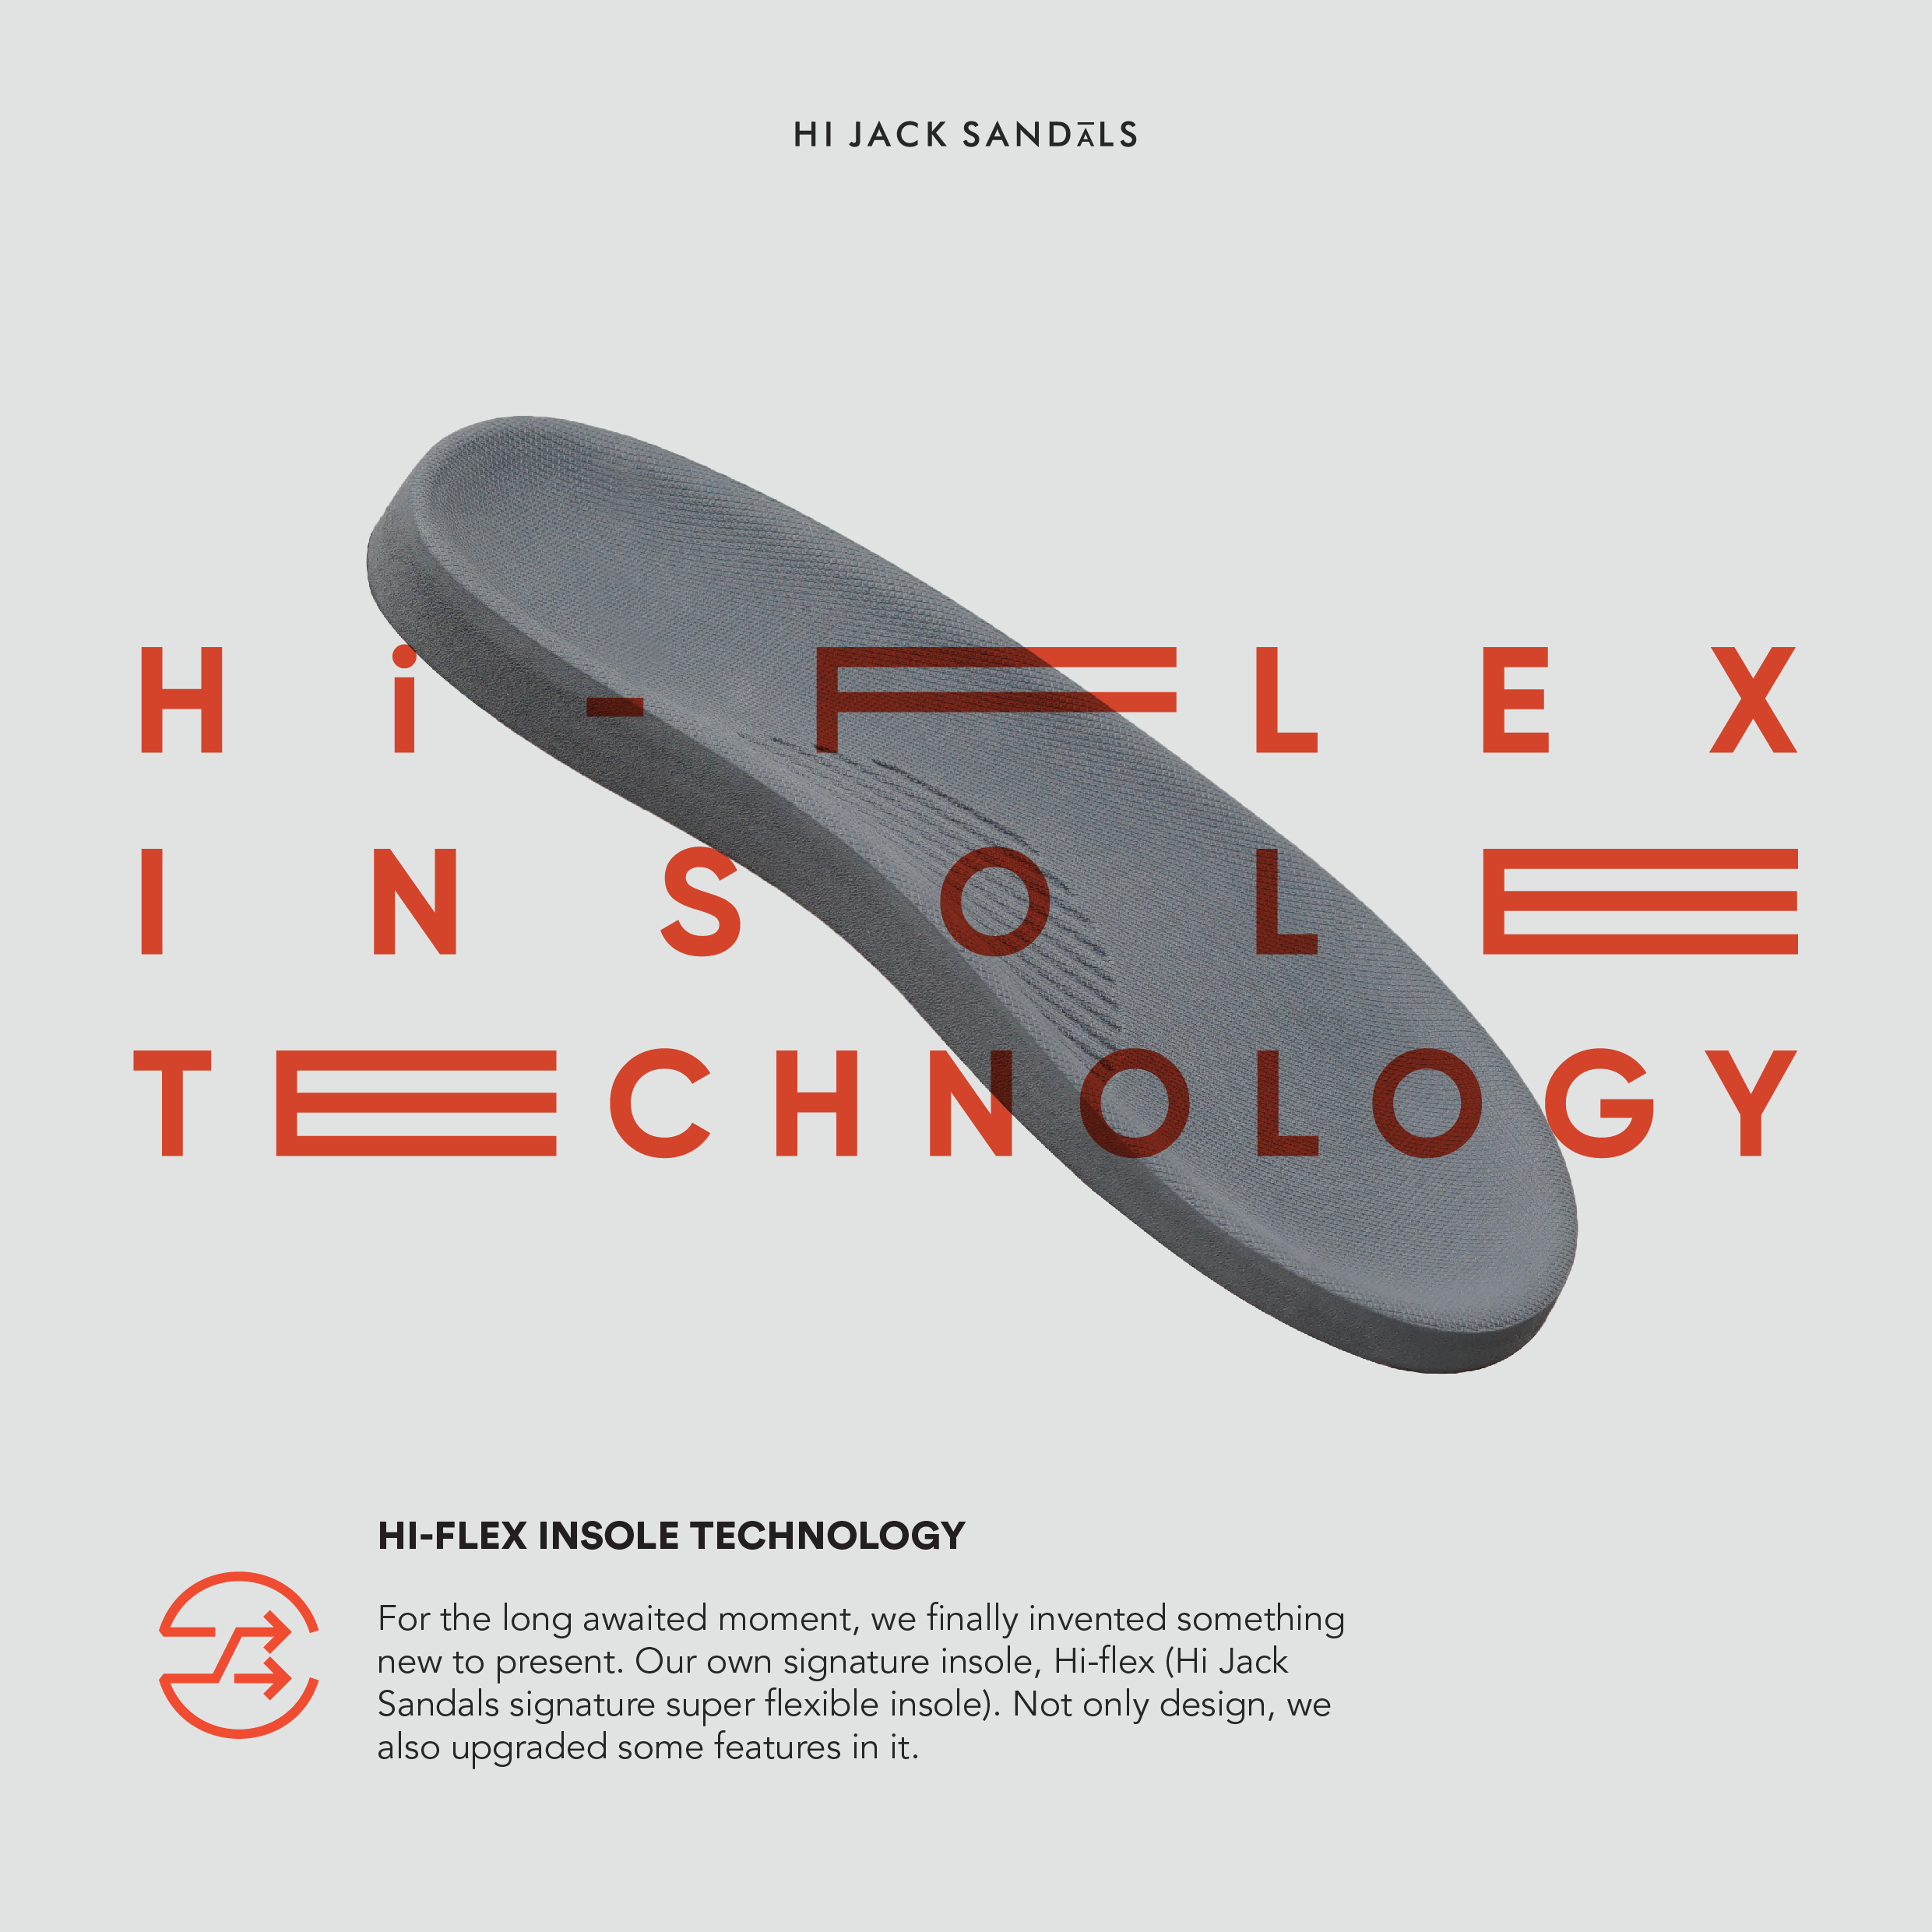 Introducing: Hi-Flex Technology